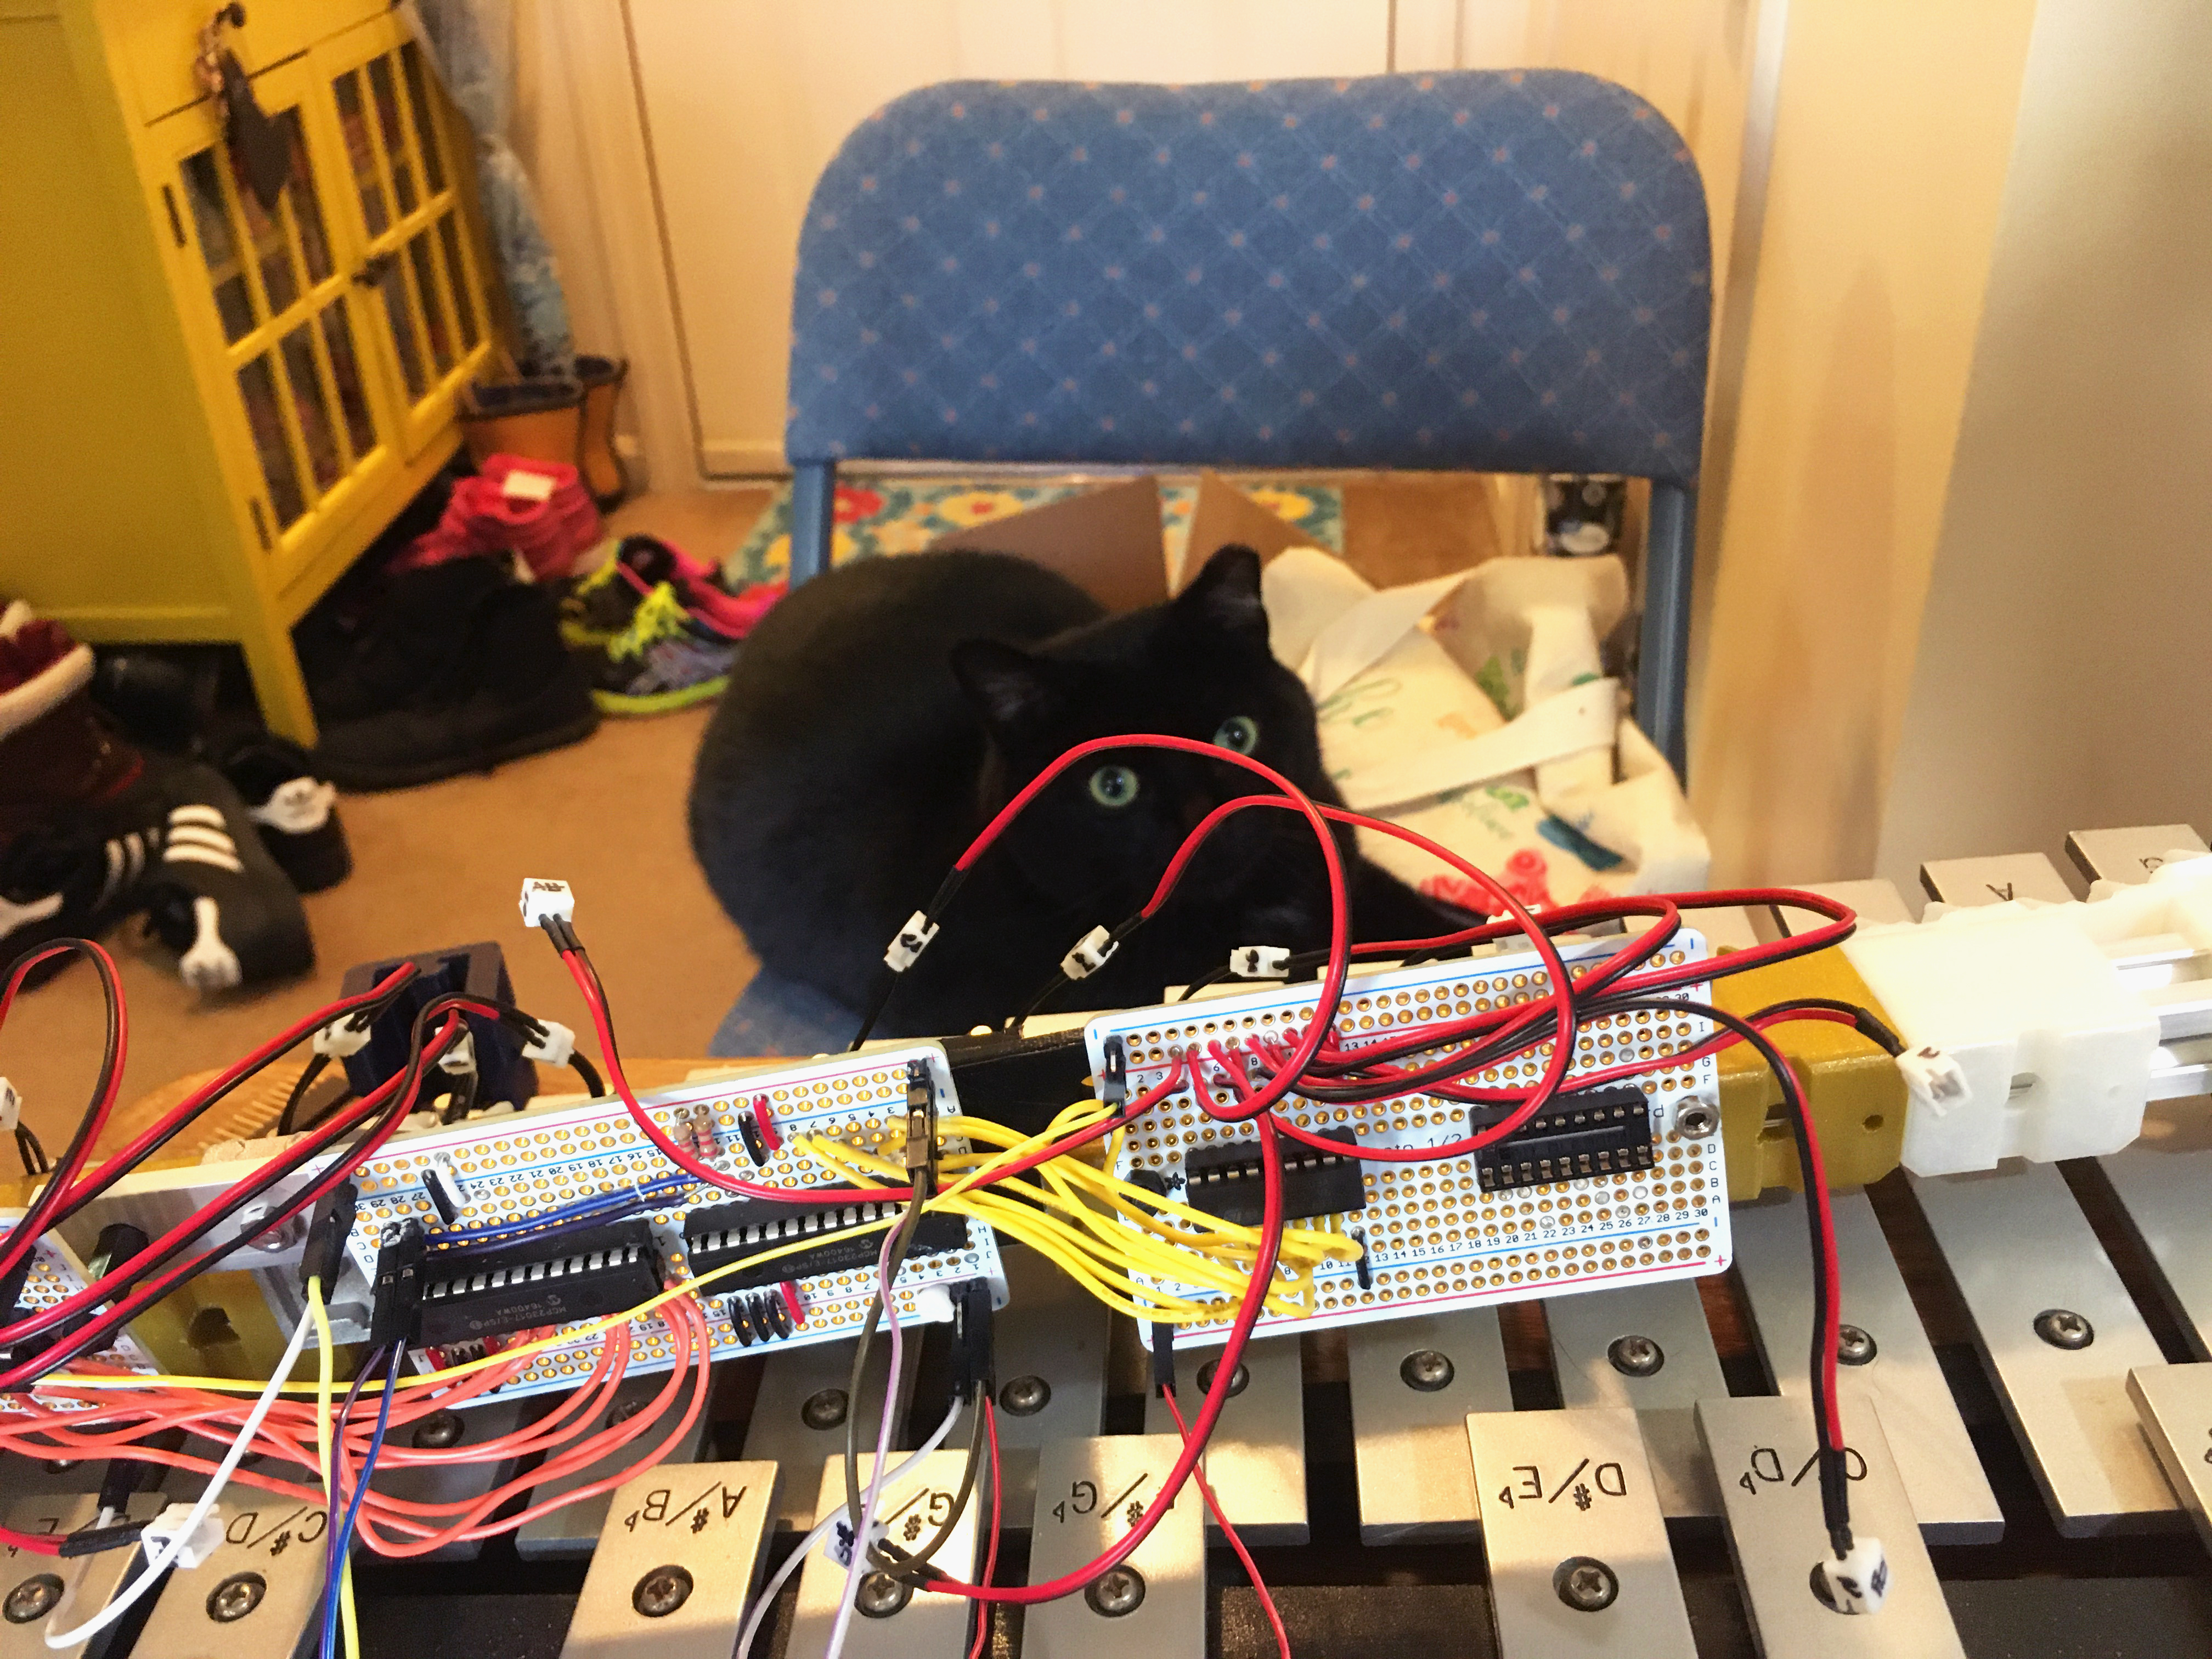 circuitpython_IMG_9948_edited.jpg